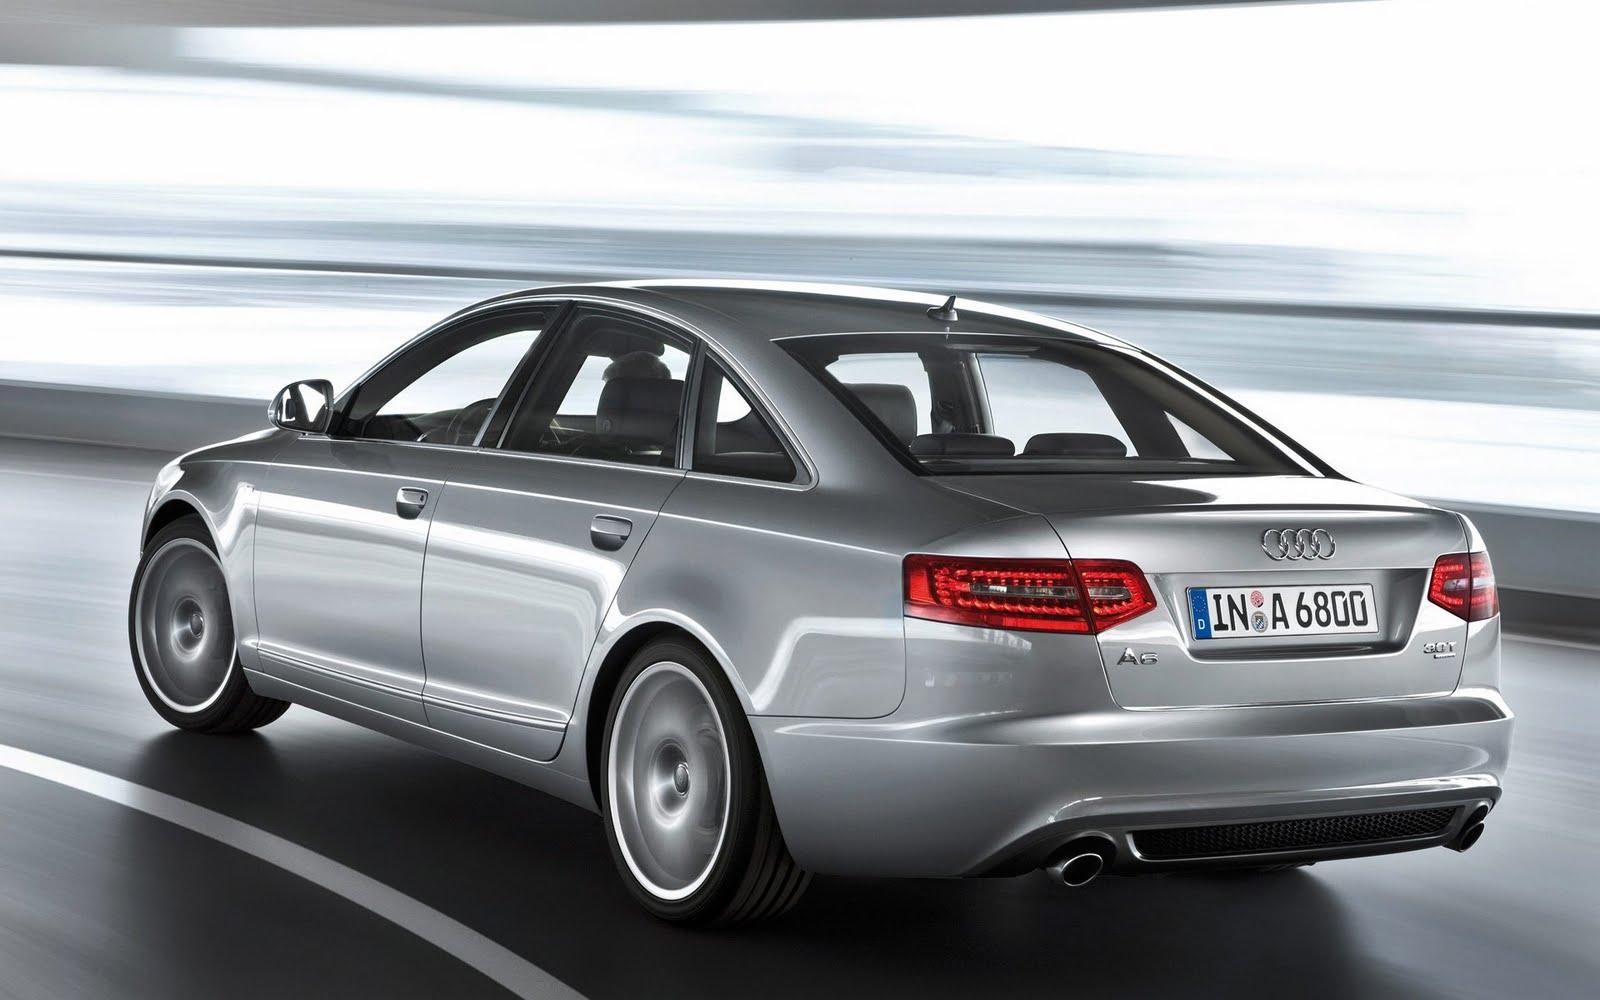 Tuning Files Audi A6 (C5) 2.7 T 250hp